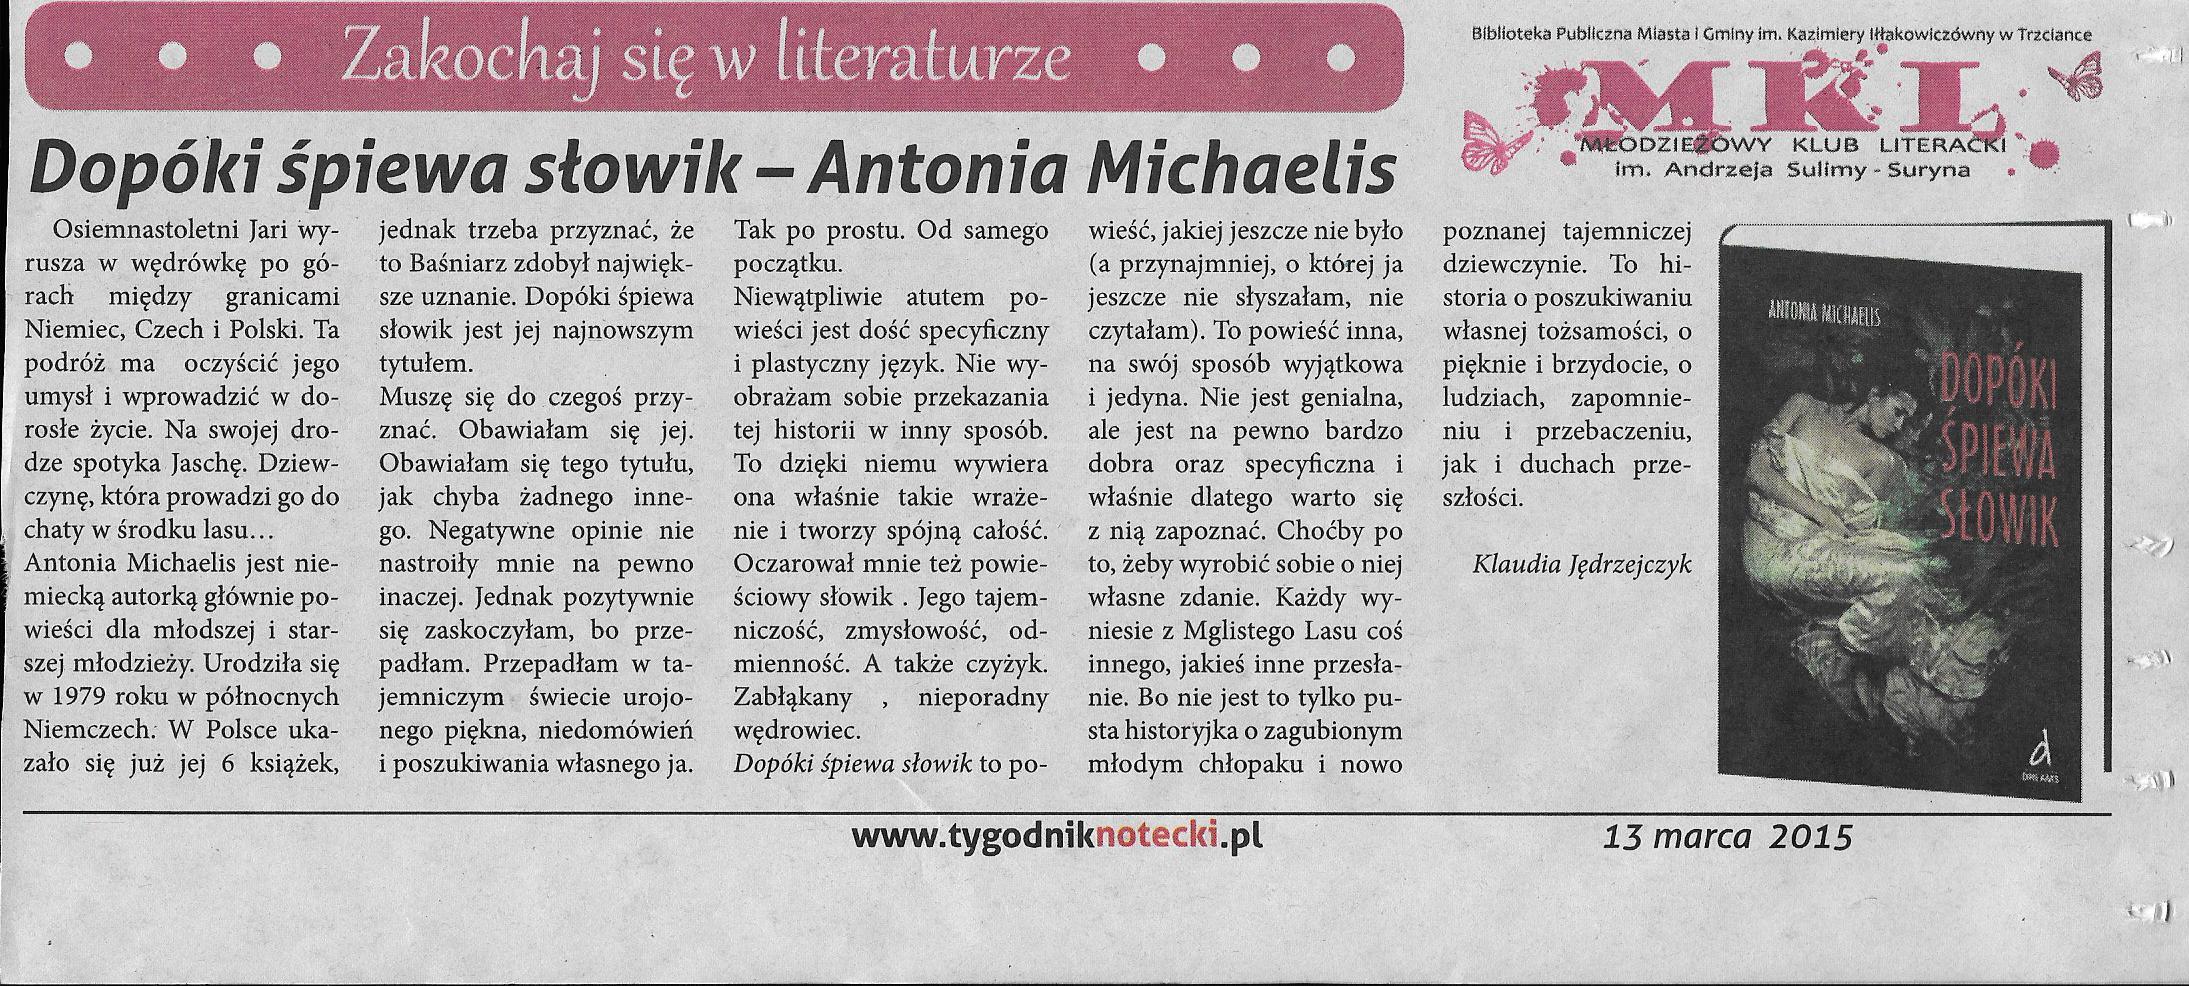 Photo: http://szeptksiazek.blogspot.com/2014/08/dopoki-spiewa-sowik-antonia-michaelis.html